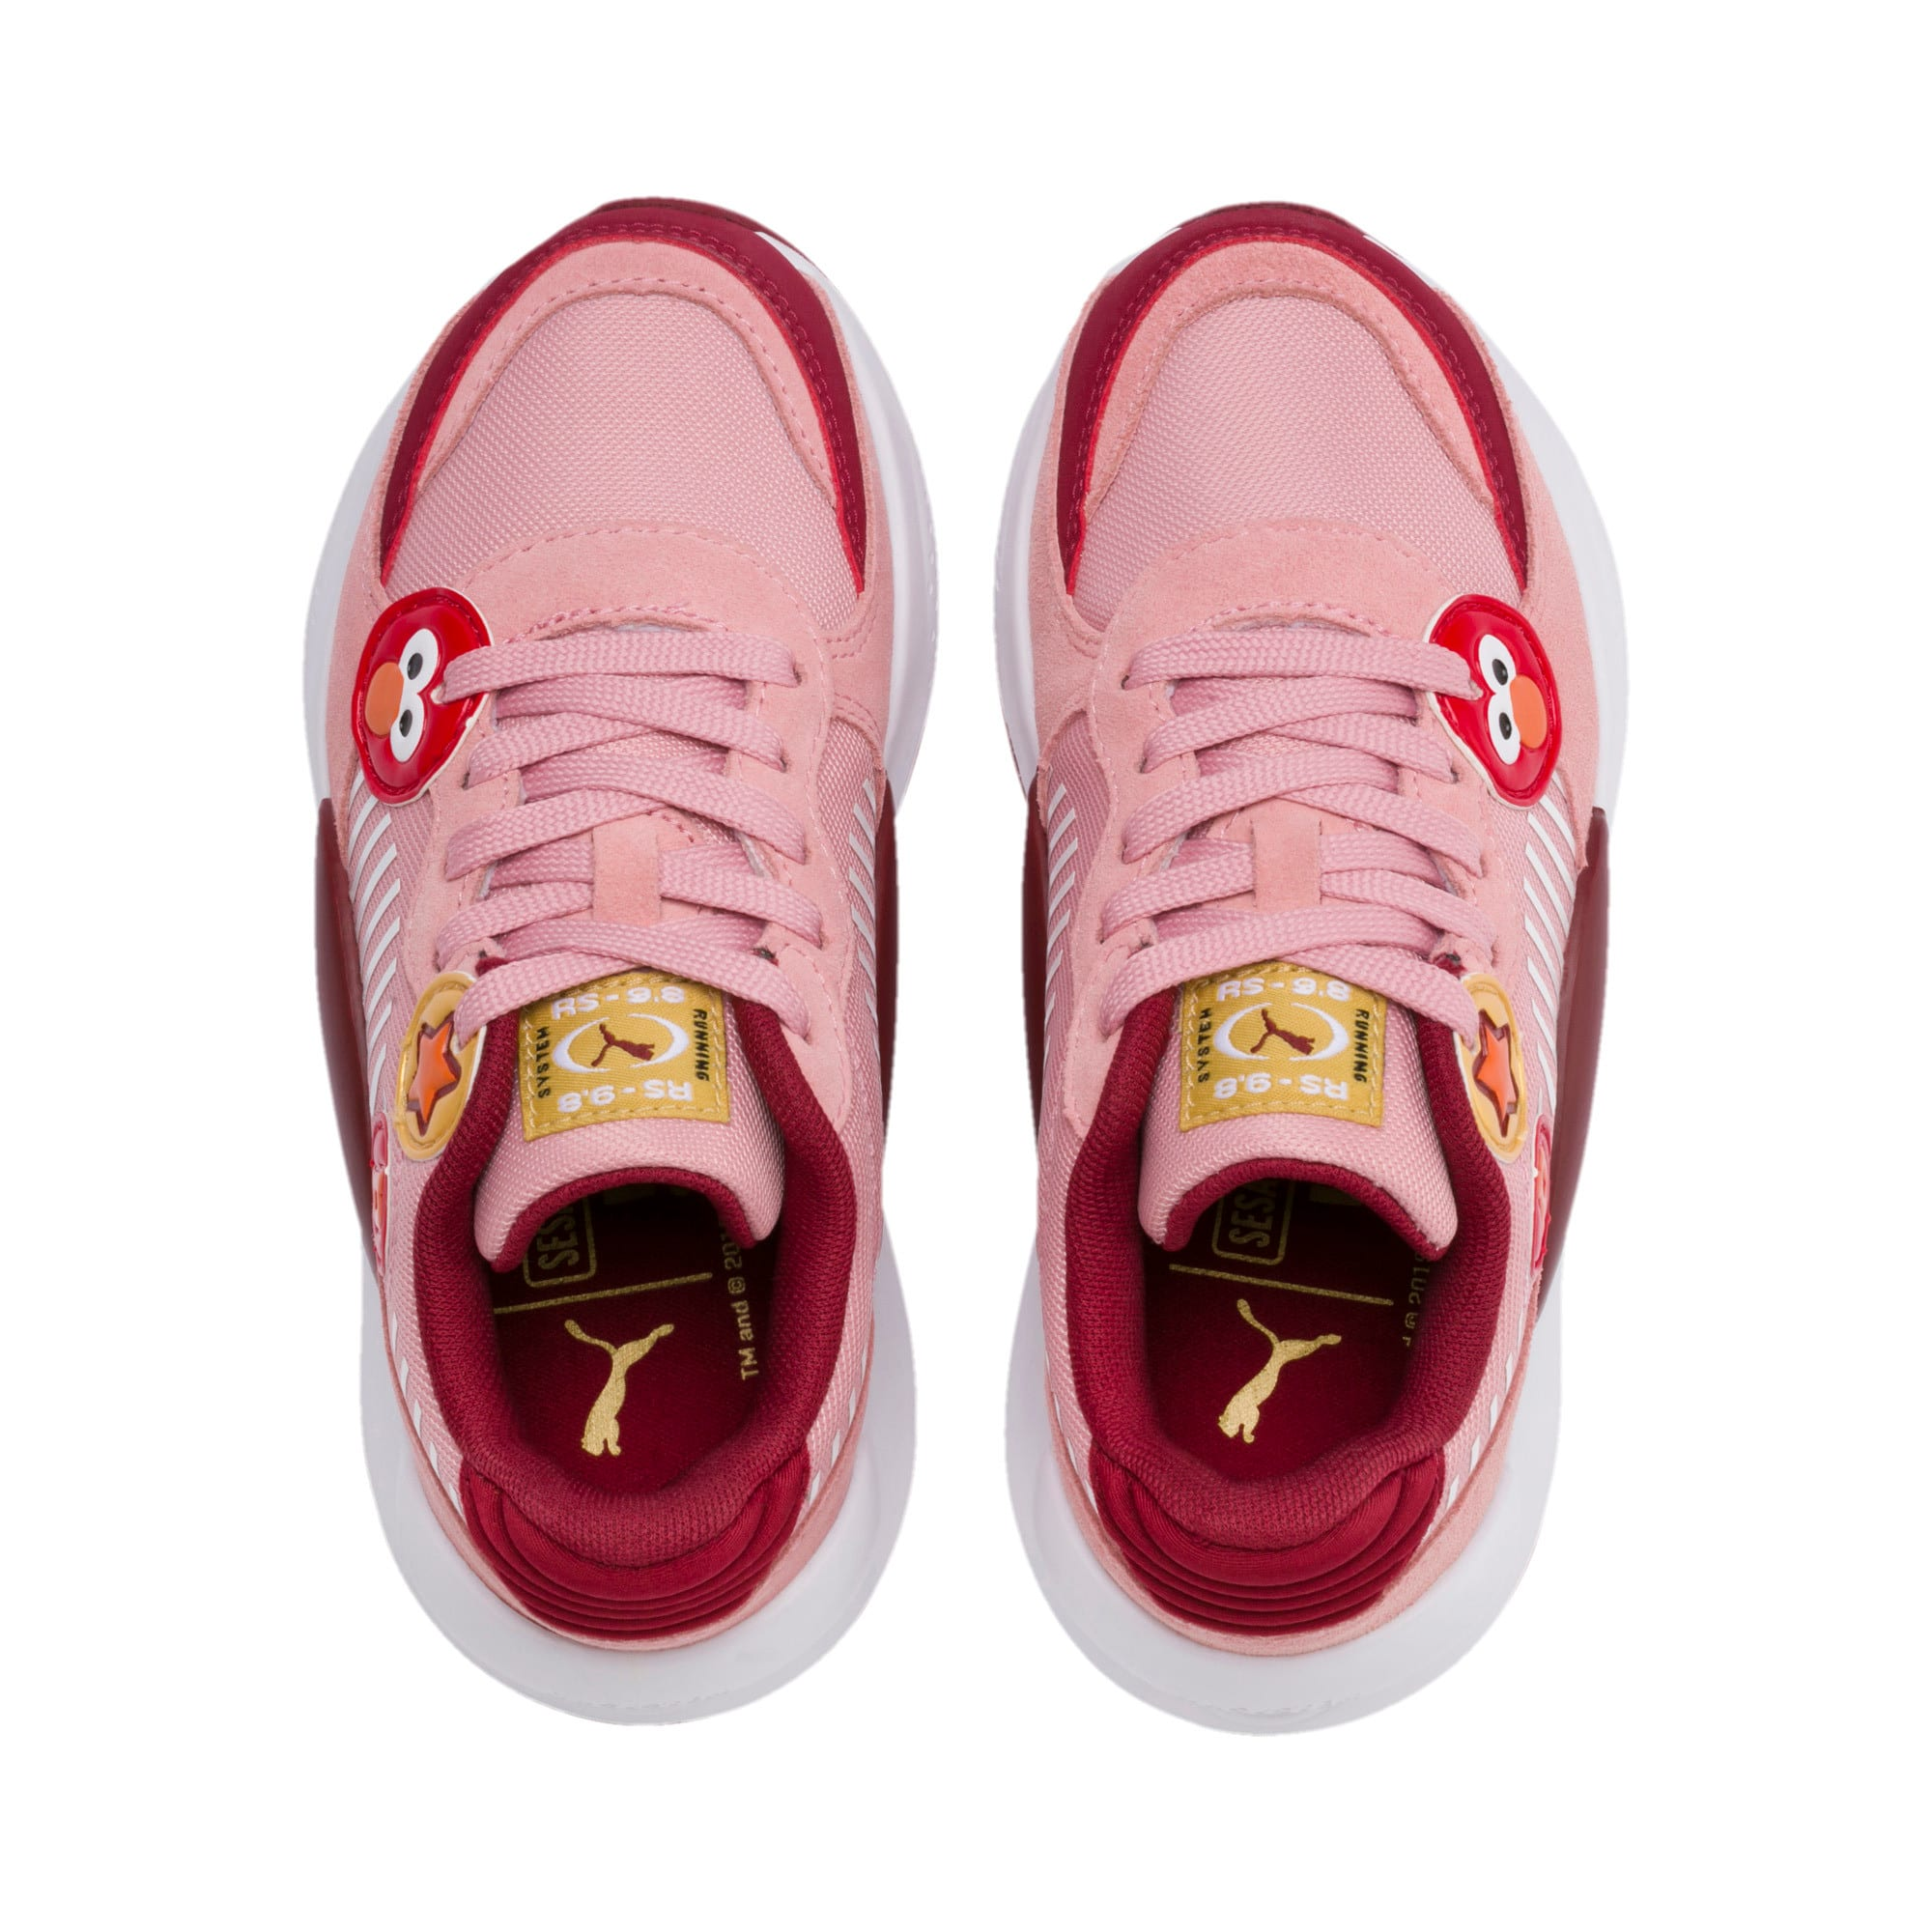 Thumbnail 6 of PUMA x SESAME STREET 50 RS 9.8 Little Kids' Shoes, Bridal Rose-Rhubarb, medium